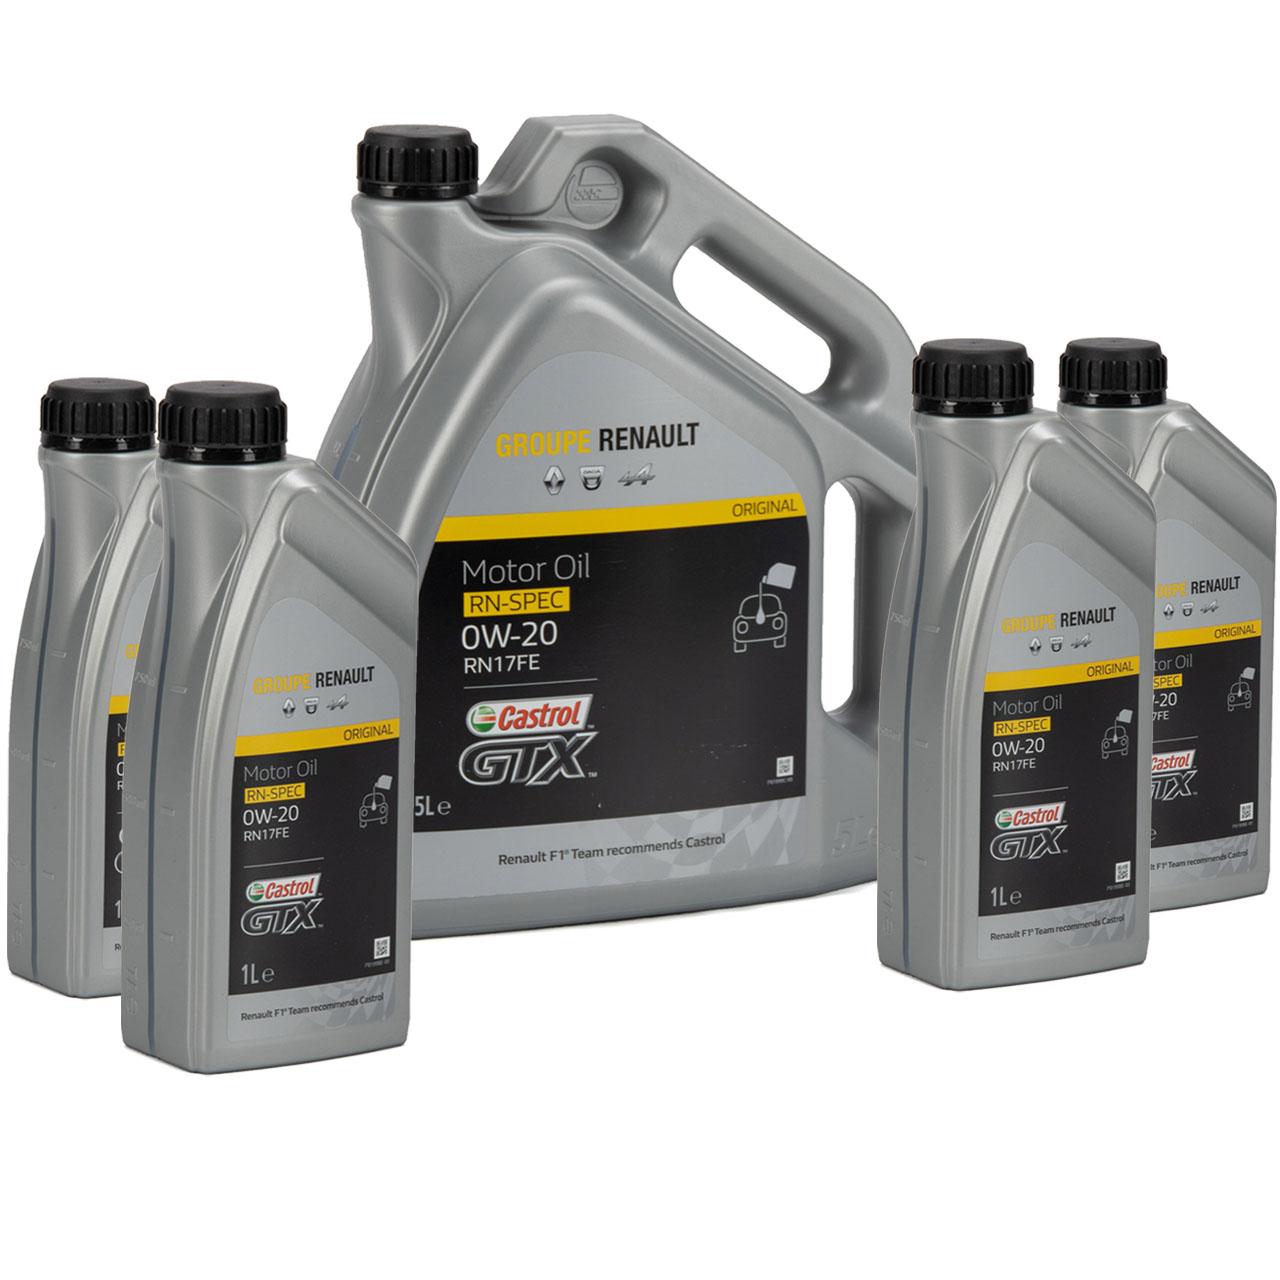 CASTROL Motoröl Öl GTX RN-SPEC 0W-20 0W20 für Renault RN17FE - 9L 9 Liter